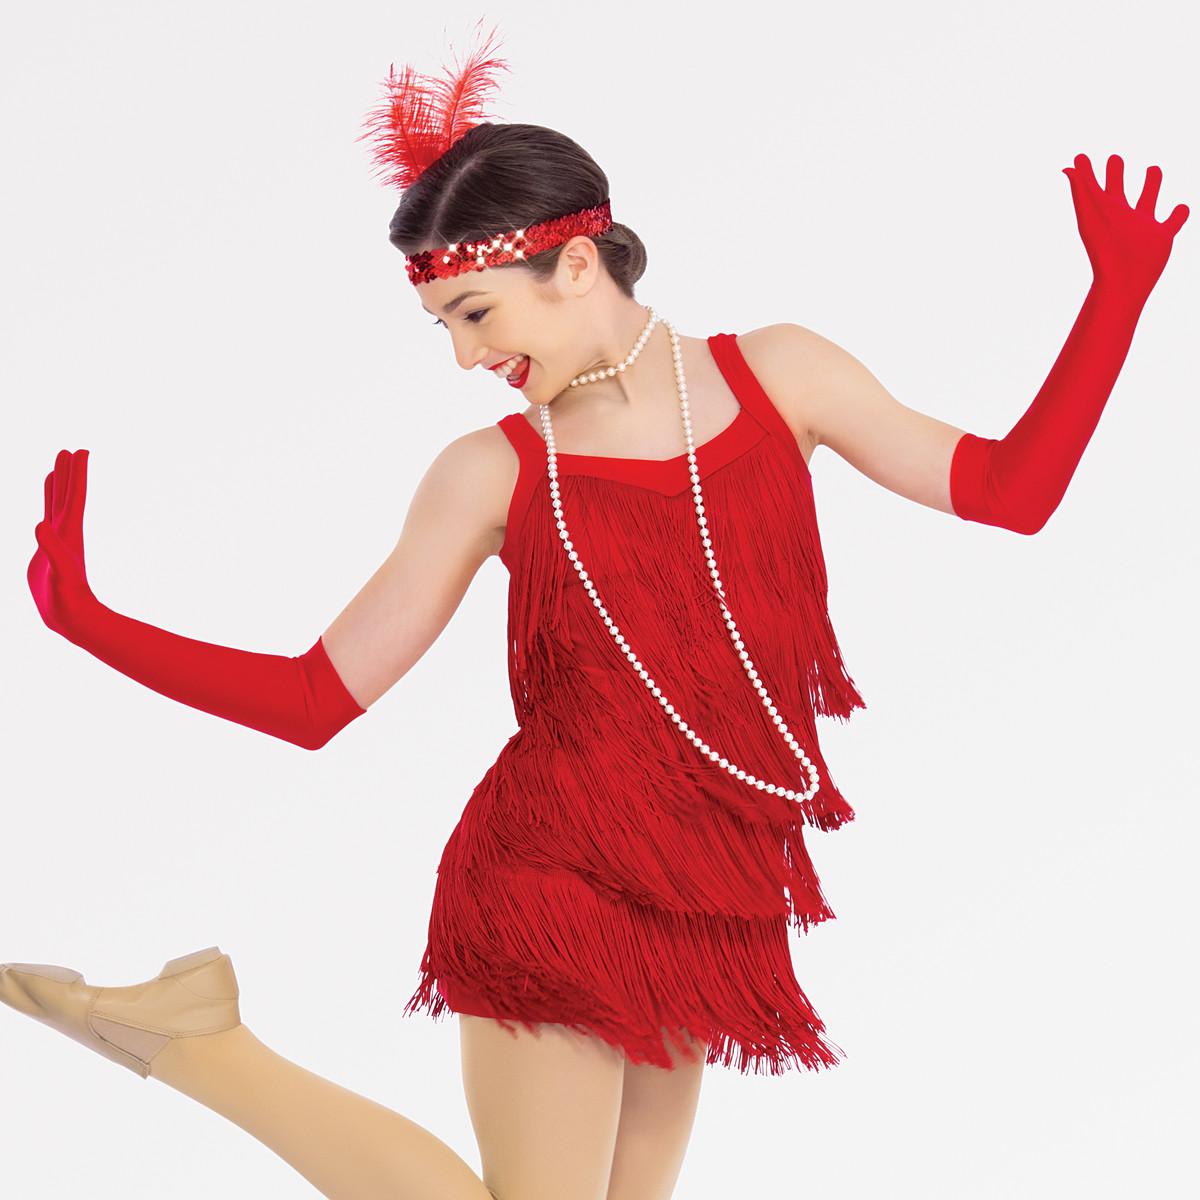 Charleston Choreography